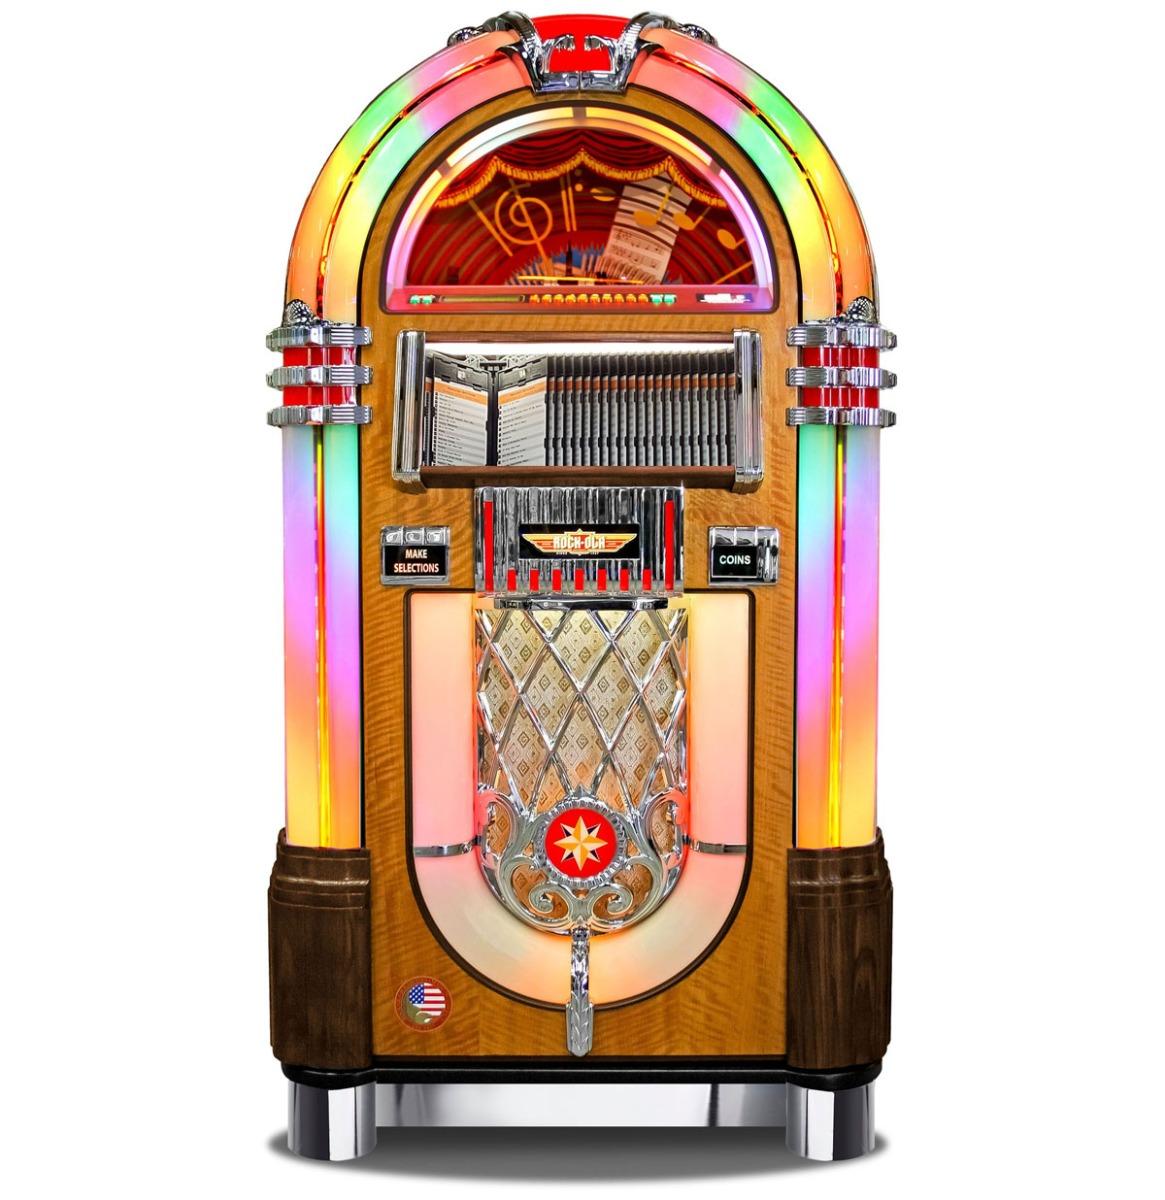 Rock-Ola 1015 CD Bubbler Jukebox - Klassiek Walnoot